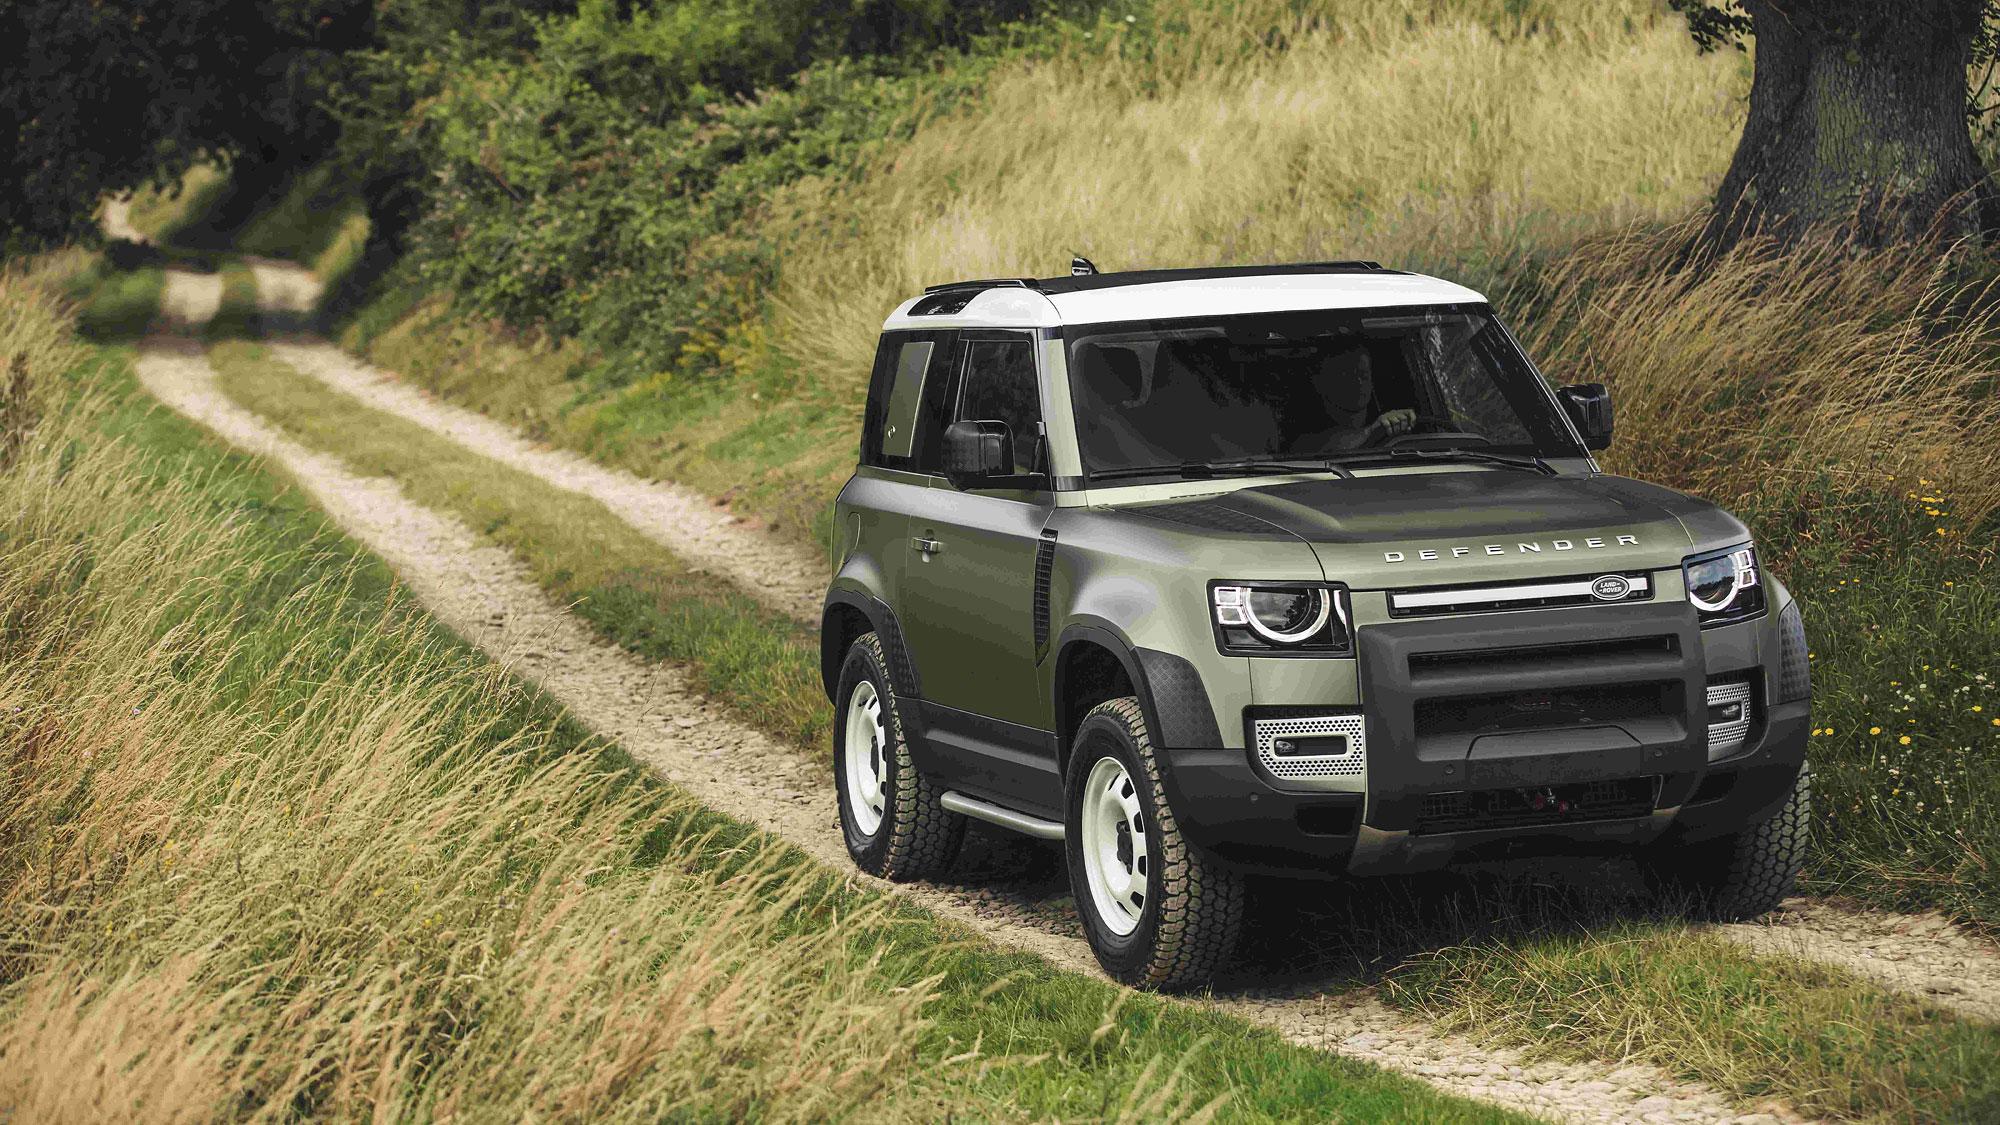 新世代 Land Rover Defender 登陸法蘭克福,預計 2020 年引進臺灣